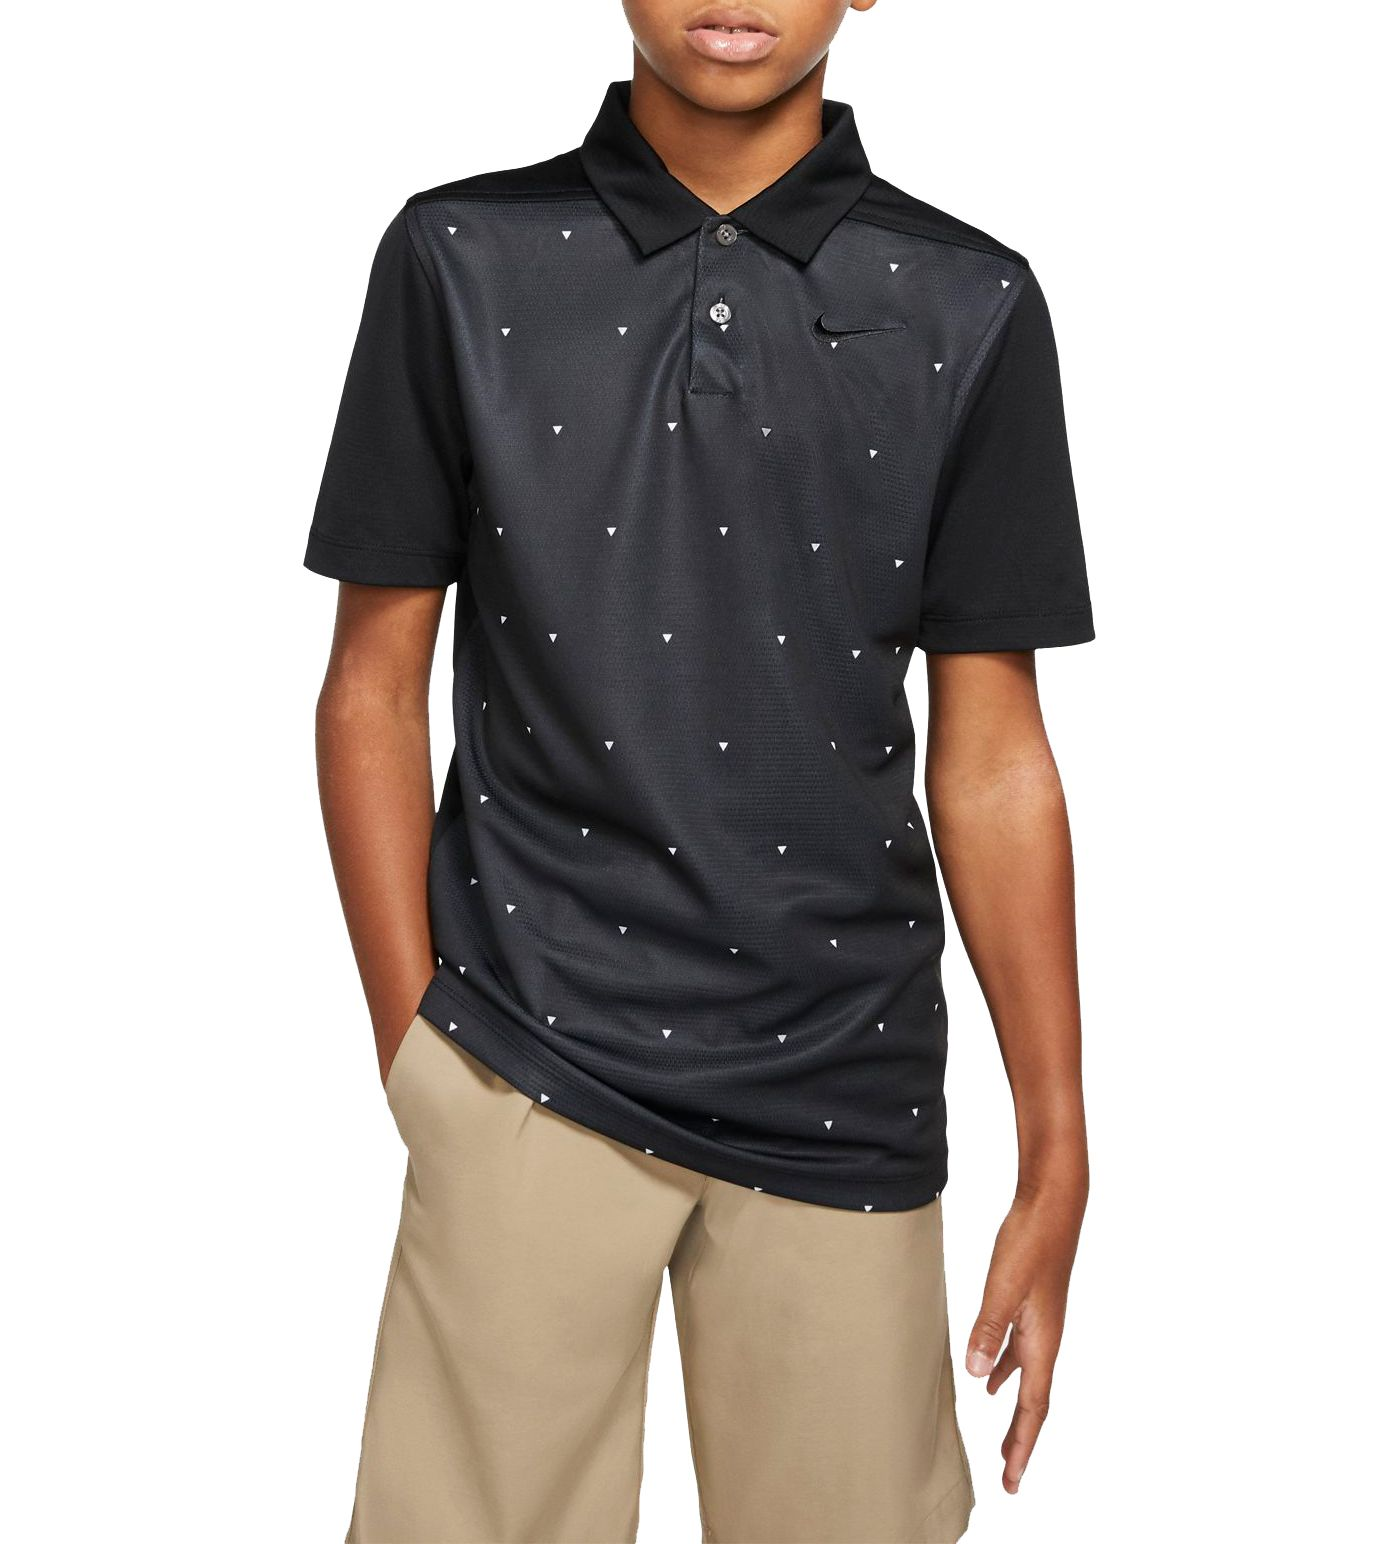 Nike Boys' Triangle Print Dri-FIT Golf Polo